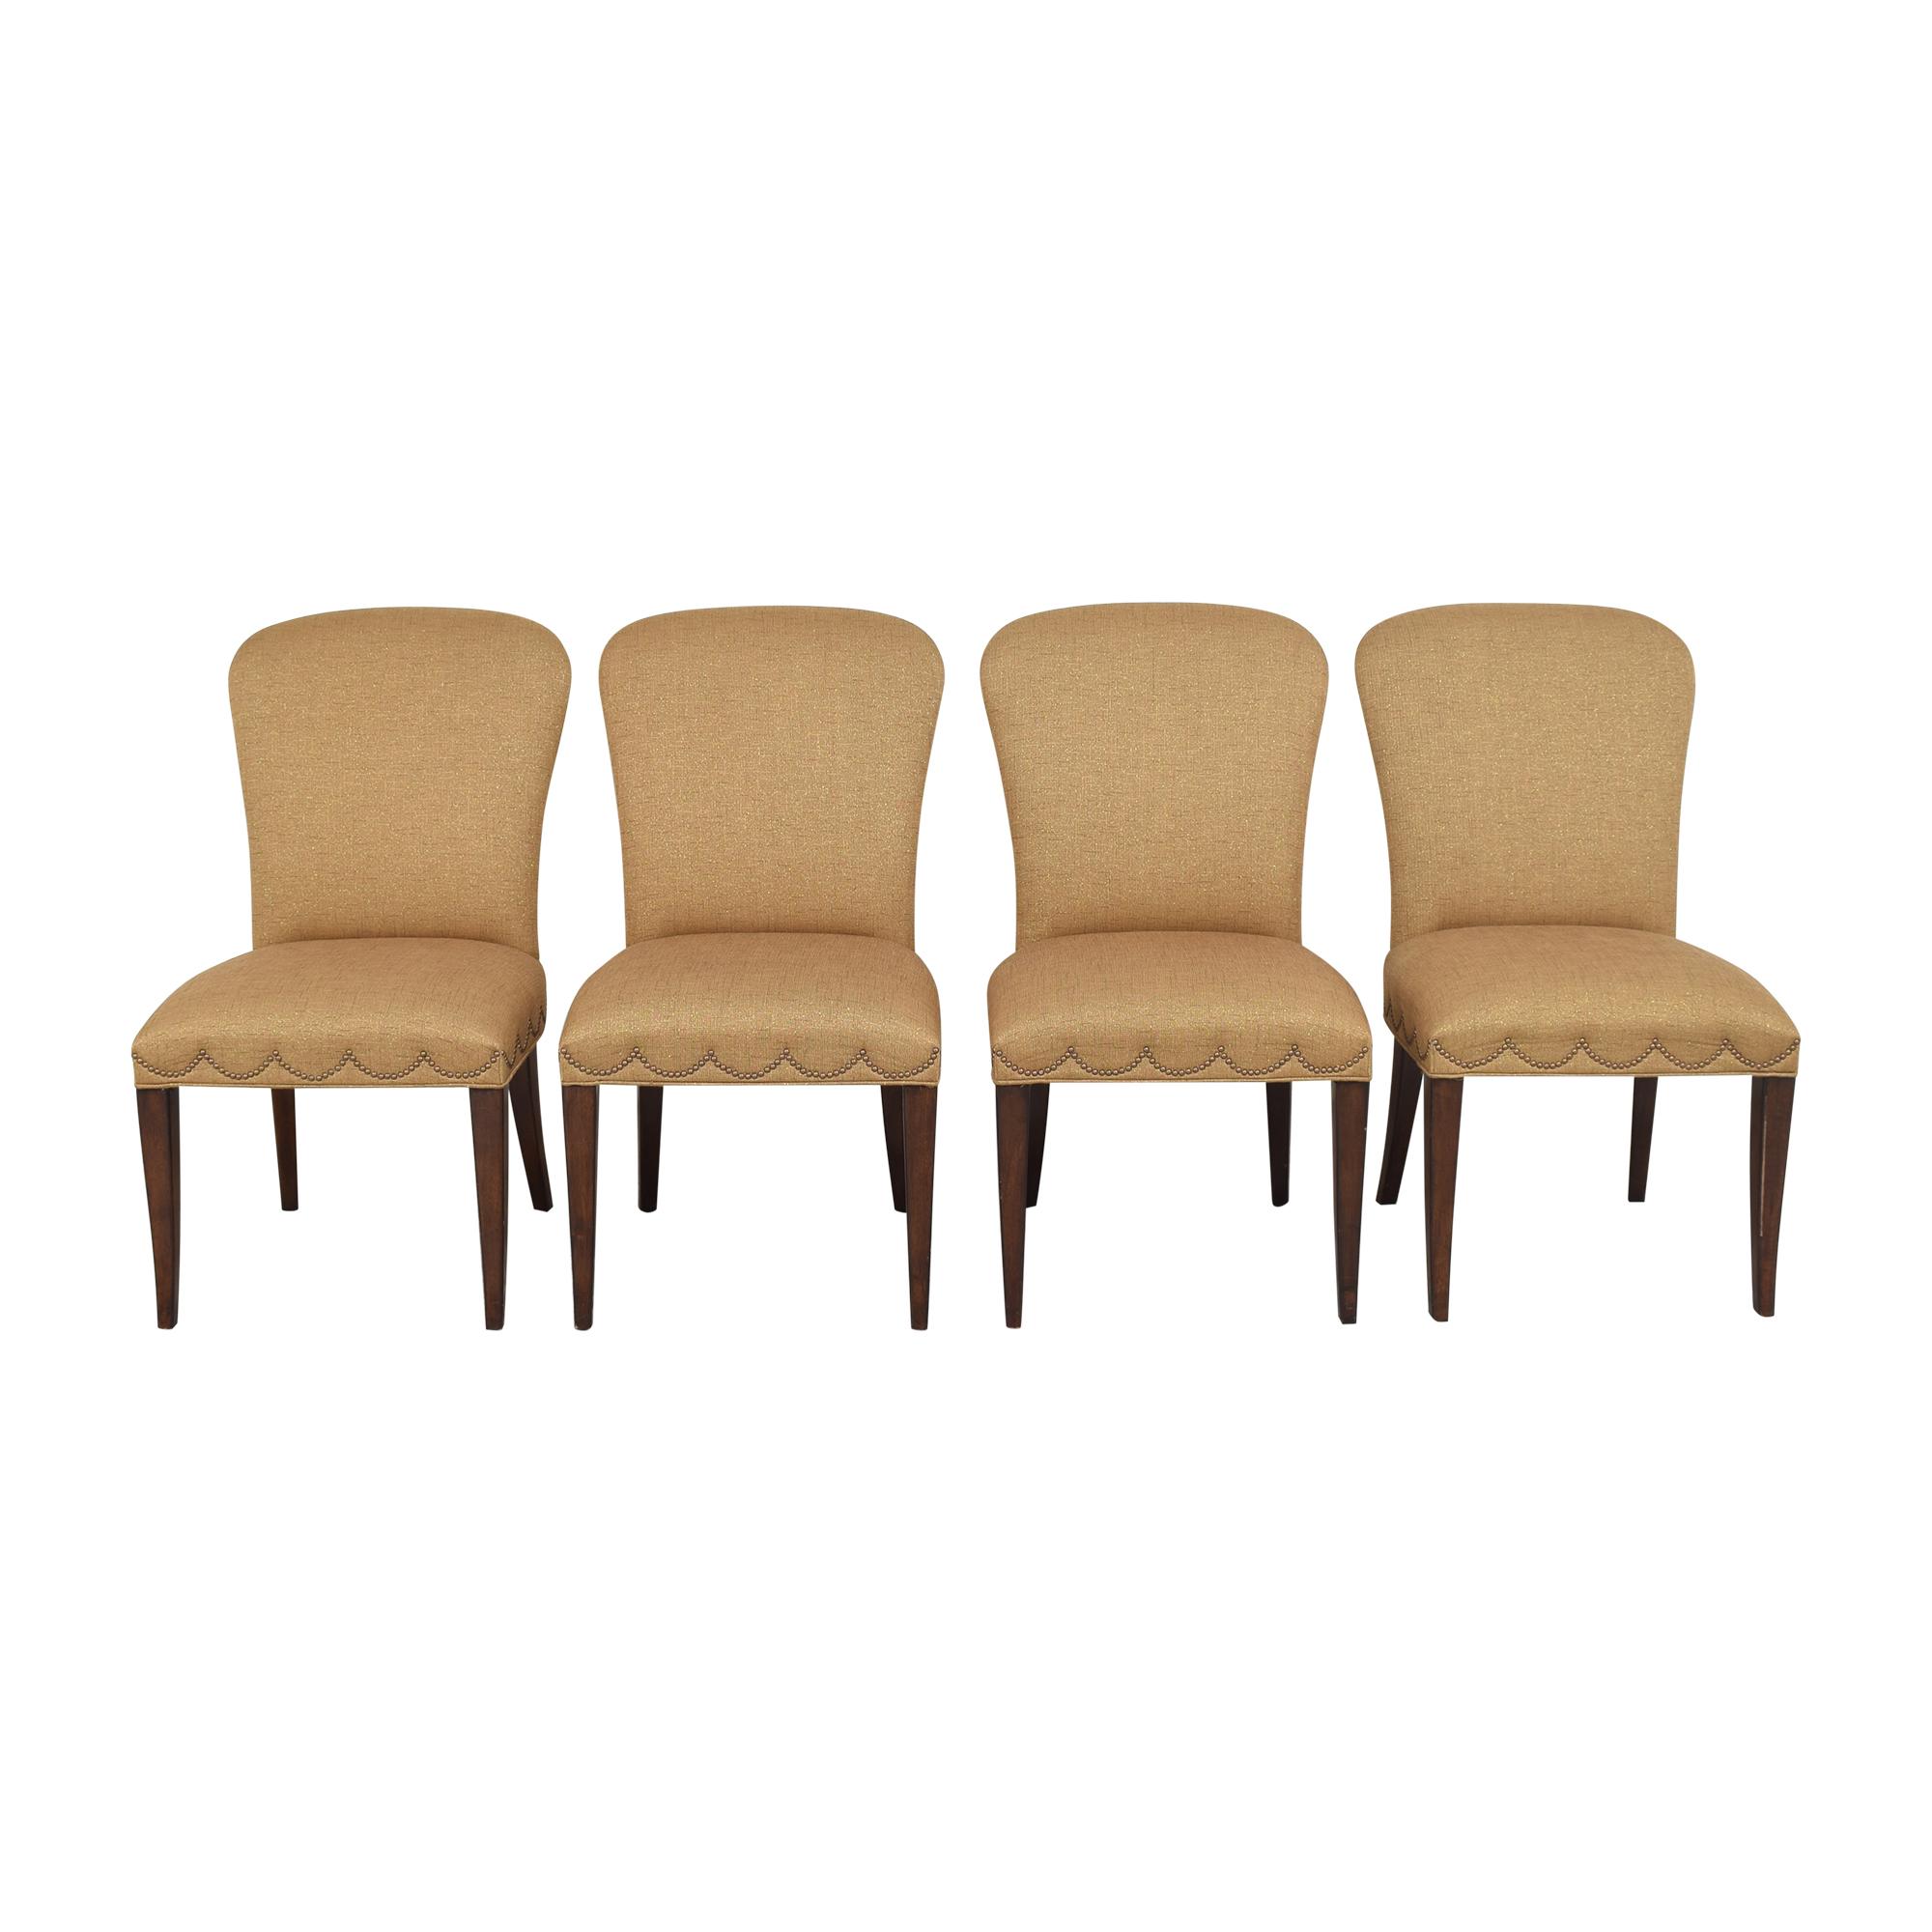 Furniture Brands International Furniture Brands International Scalloped Nailhead Dining Chairs second hand